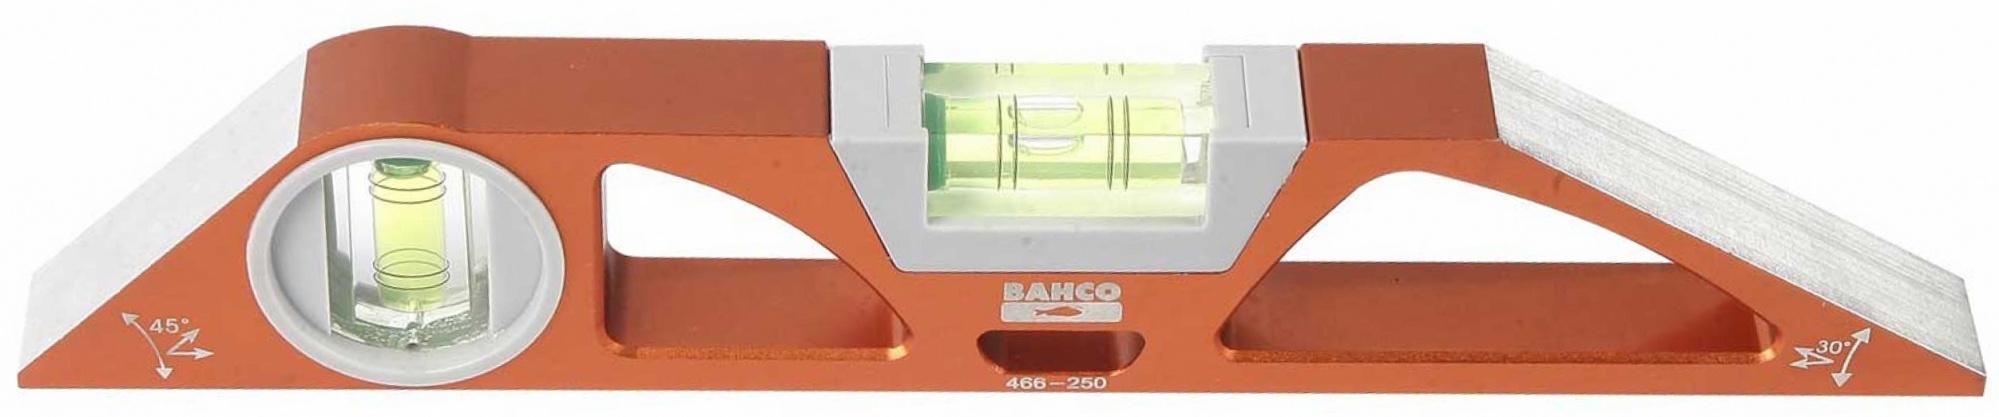 Уровень Bahco 250 мм (466-250)